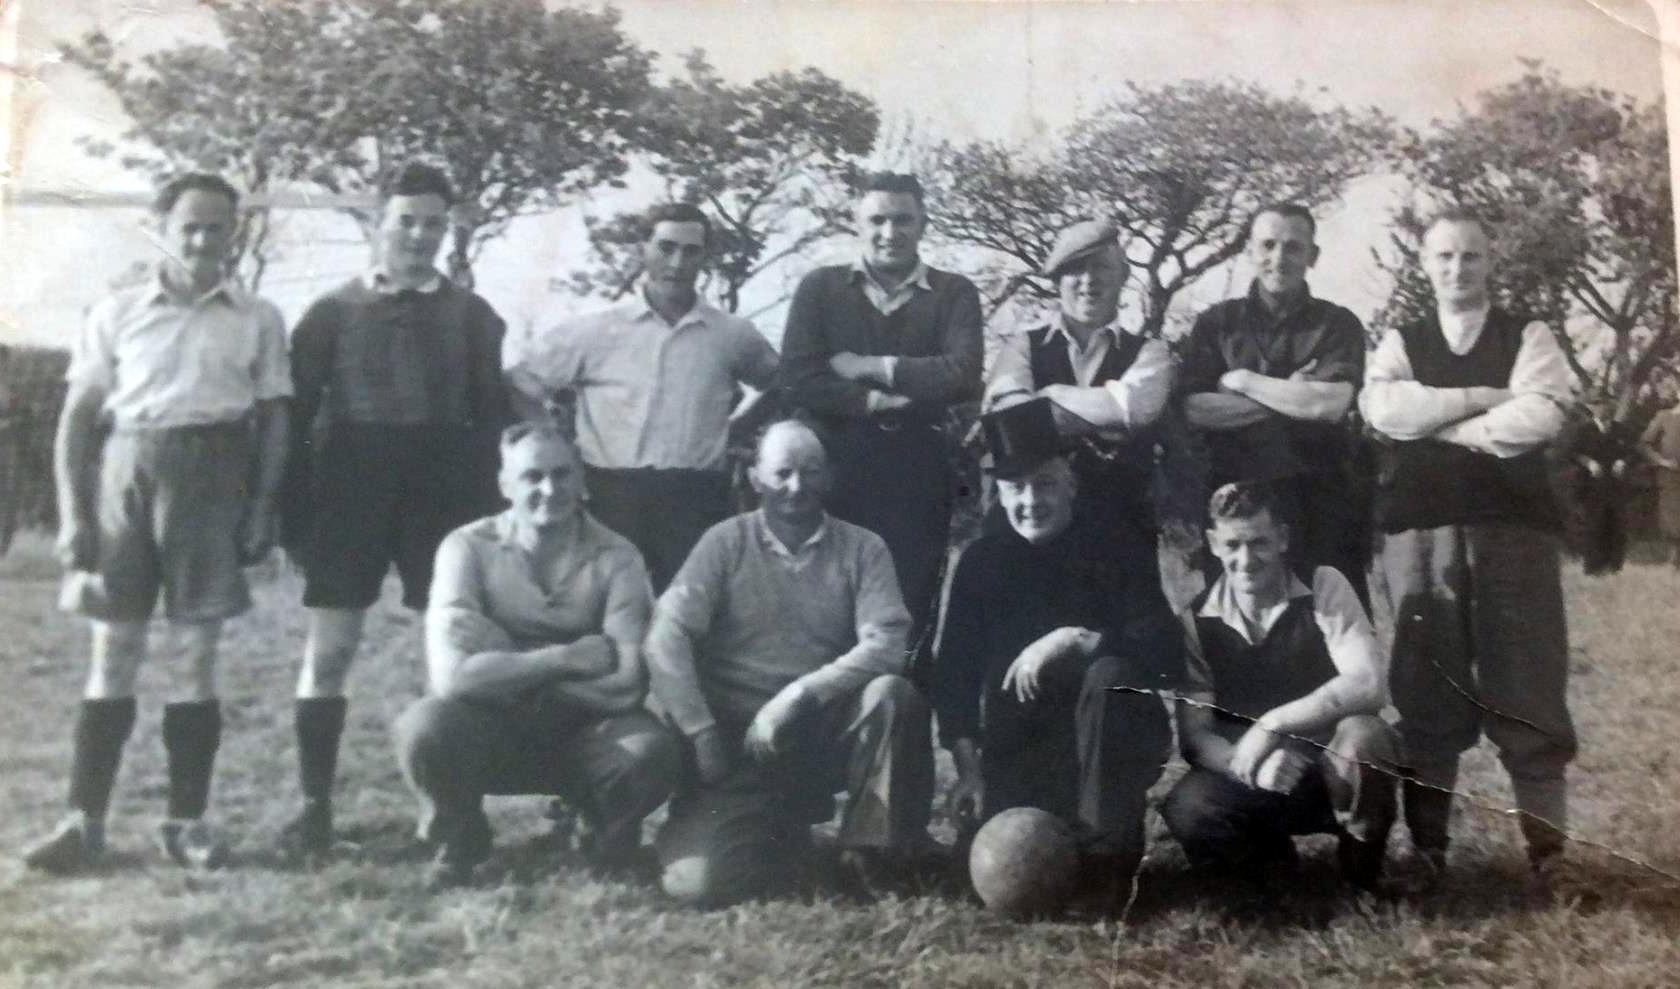 Altarnun/Five Lanes football team